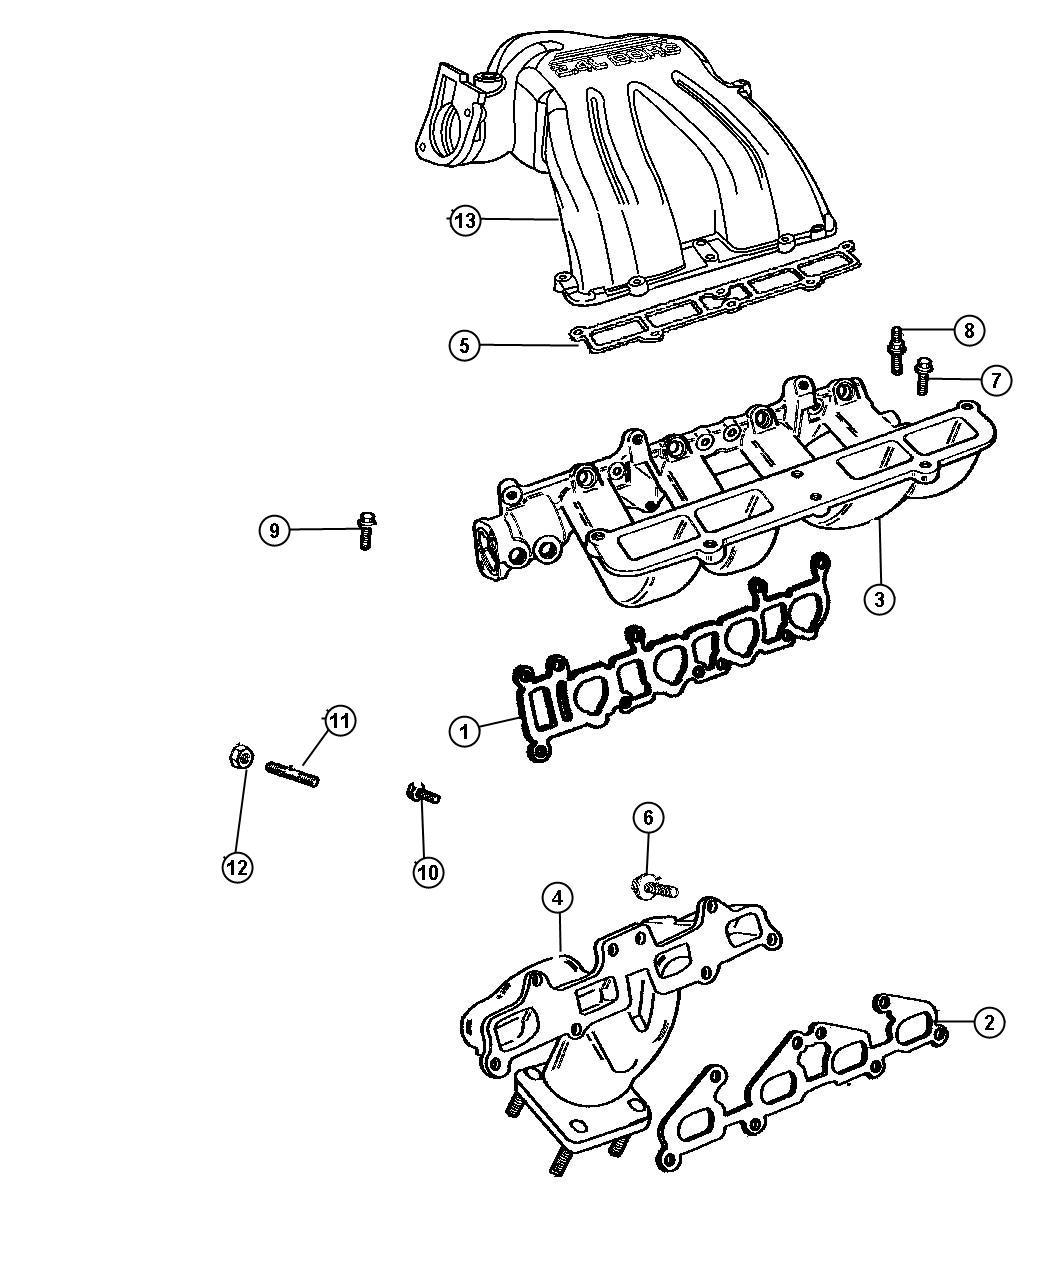 Dodge Caravan Manifolds Intake And Exhaust 2 4l 2